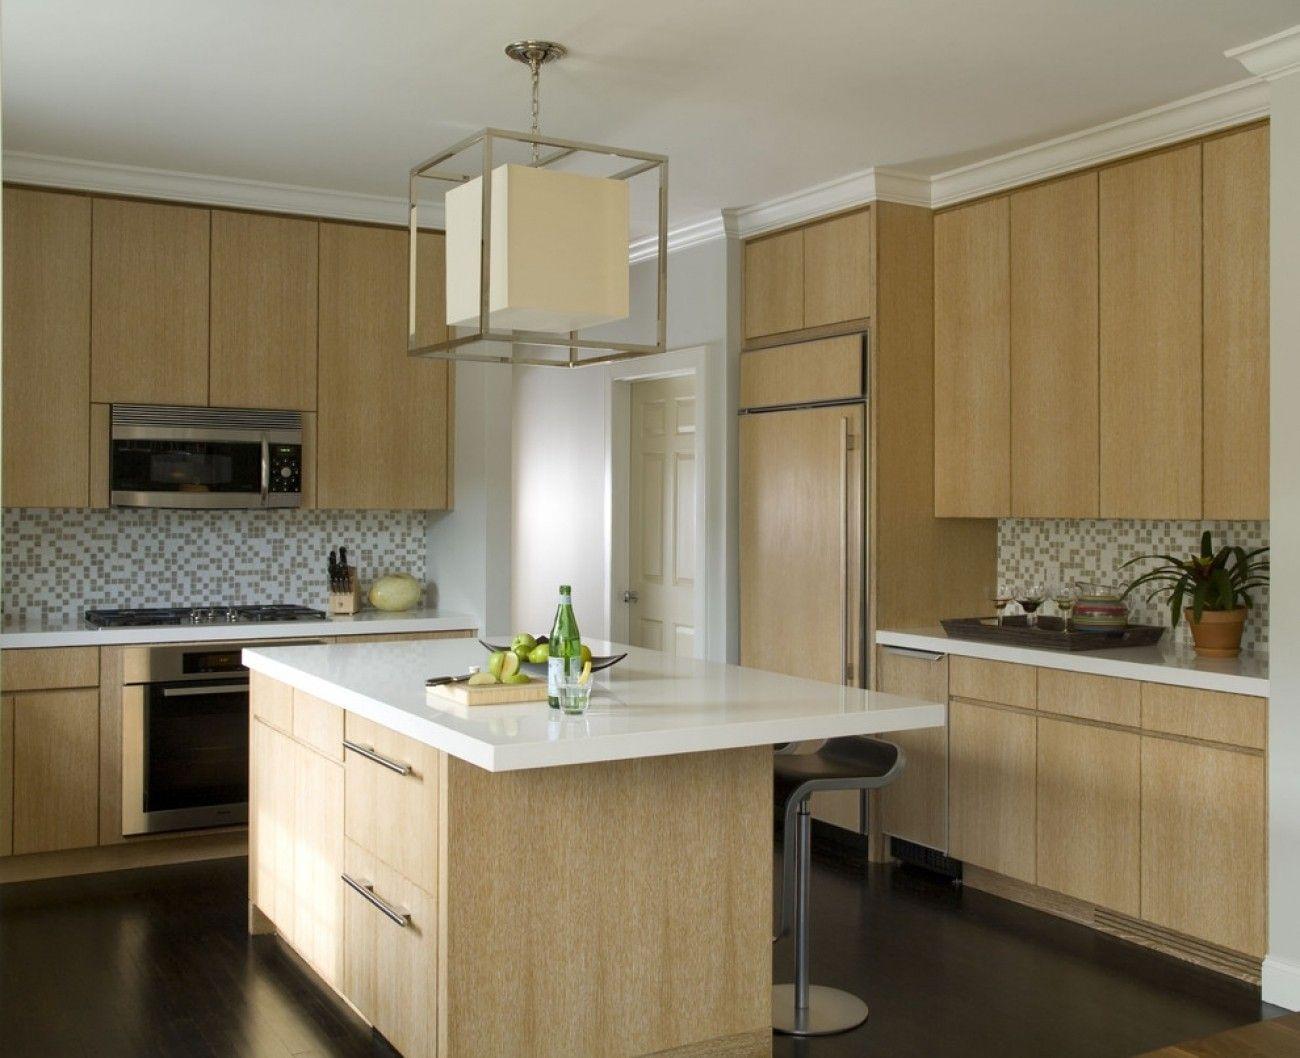 pin by andrea burkhart on remodel light wood kitchens kitchen cabinets light wood on kitchen cabinets light wood id=32164